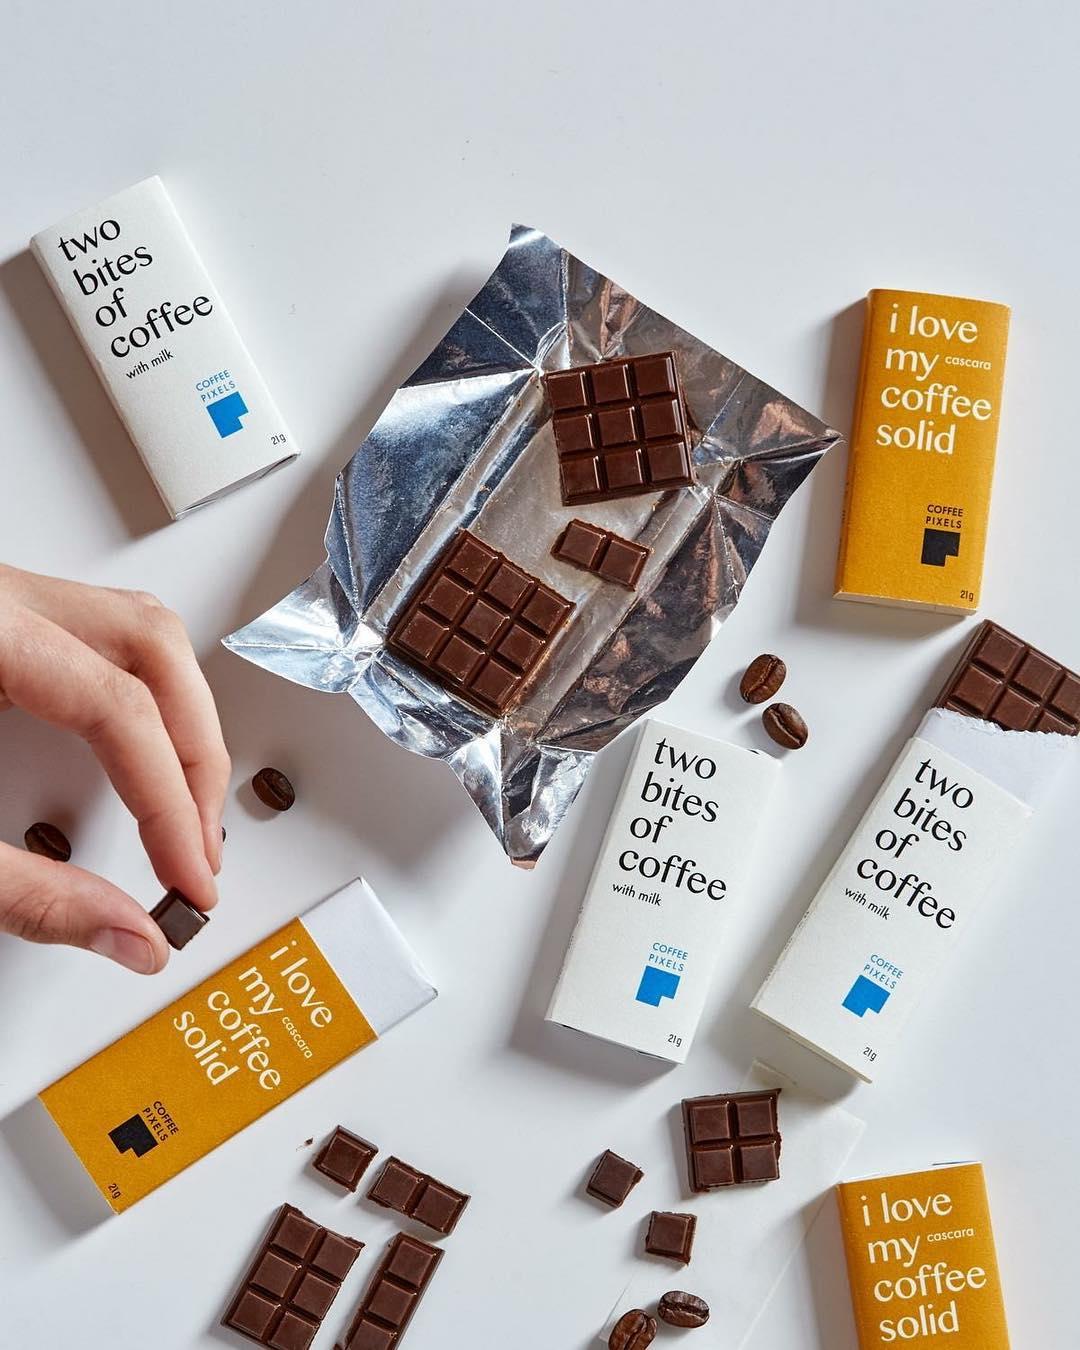 sogeres-barres-cafe-comestibles-coffee-pixels